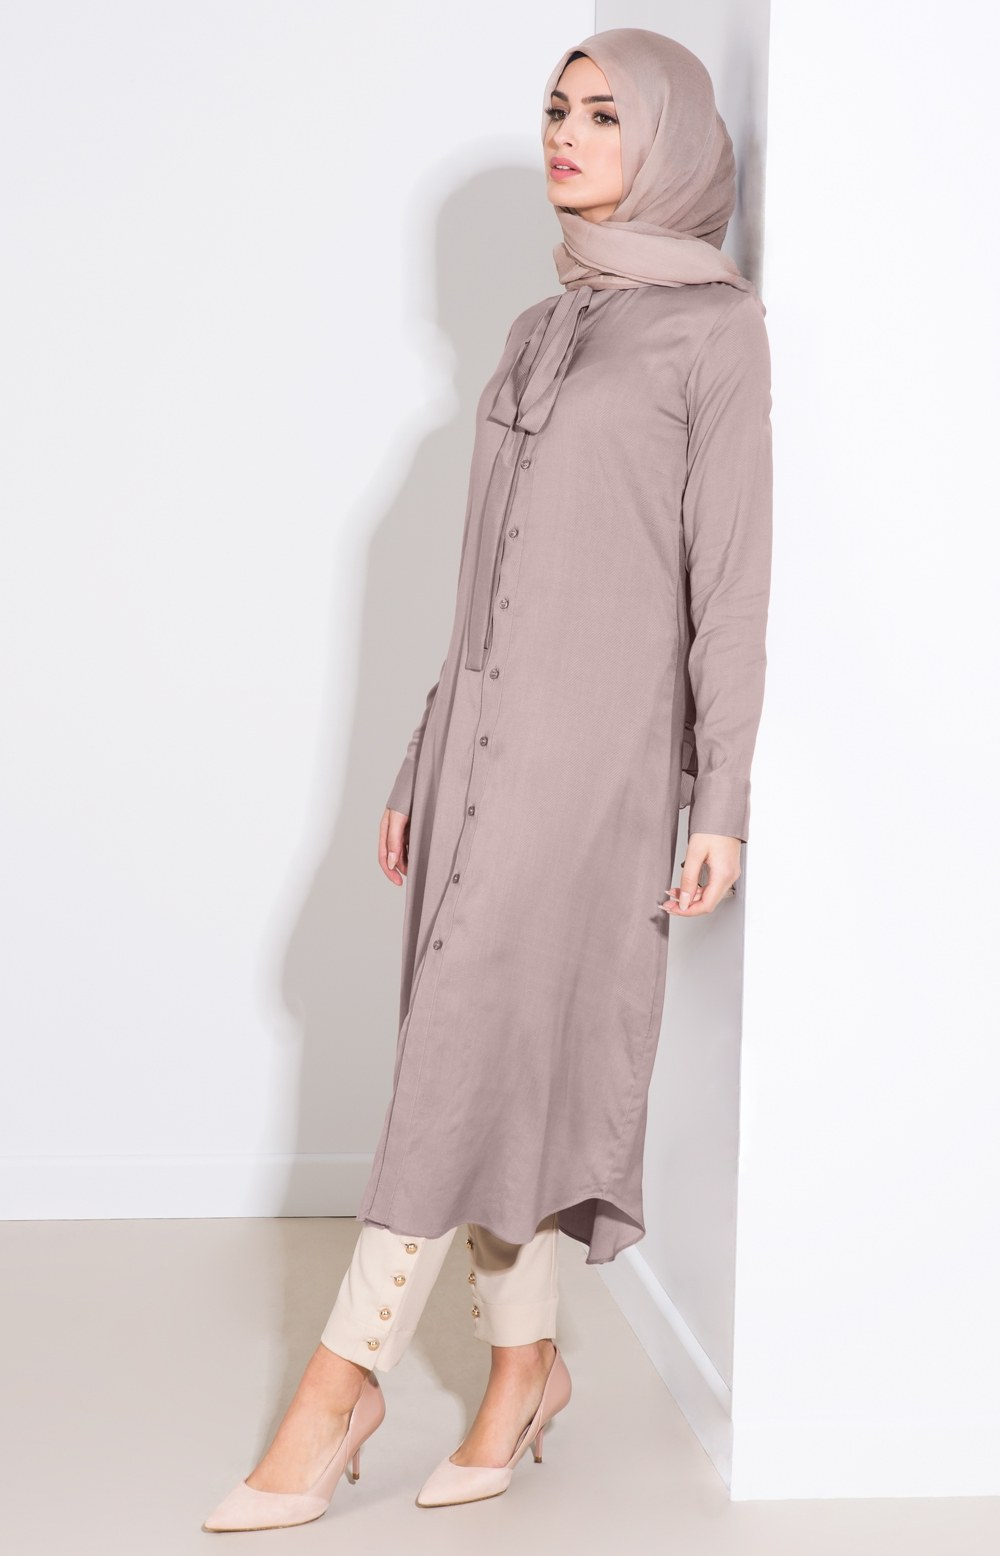 Bentuk Model Baju Lebaran Wanita Terbaru E6d5 25 Trend Model Baju Muslim Lebaran 2018 Simple & Modis